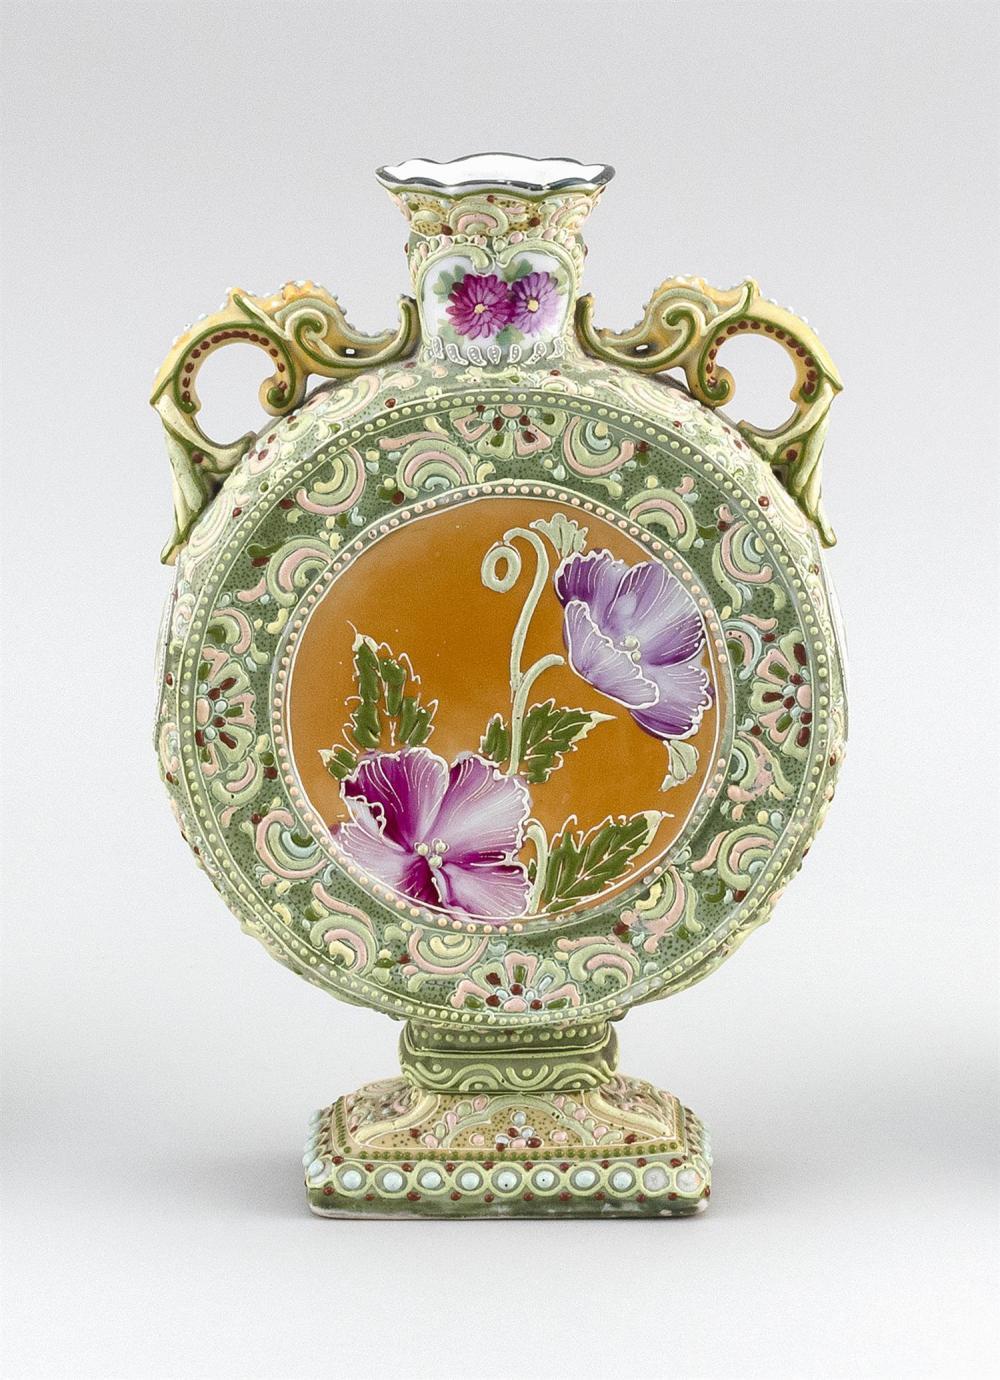 MORIAGE NIPPON PORCELAIN BOTTLE VASE In pilgrim flask form, with openwork handles, rectangular base and floral decoration. Height 10...